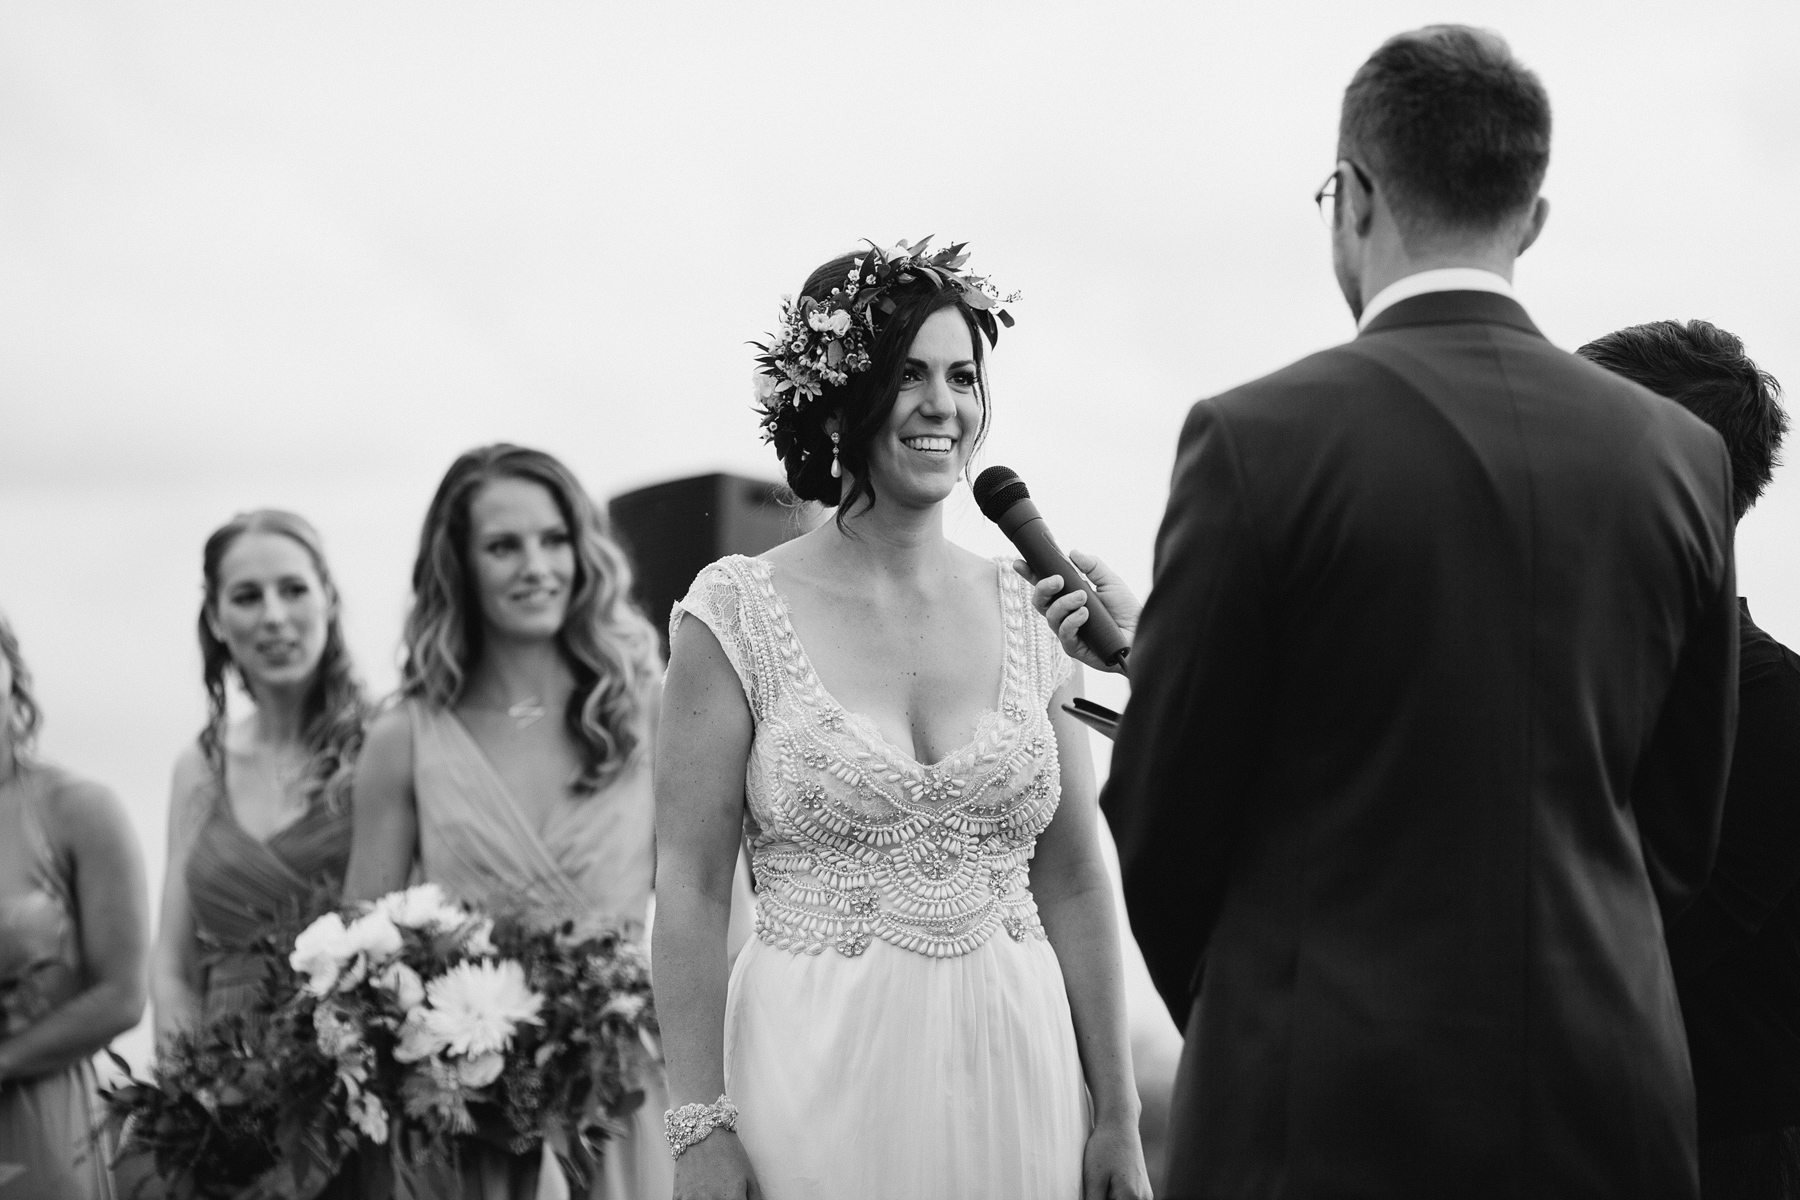 alberta-farm-wedding-photographer-rp-wj-130.jpg